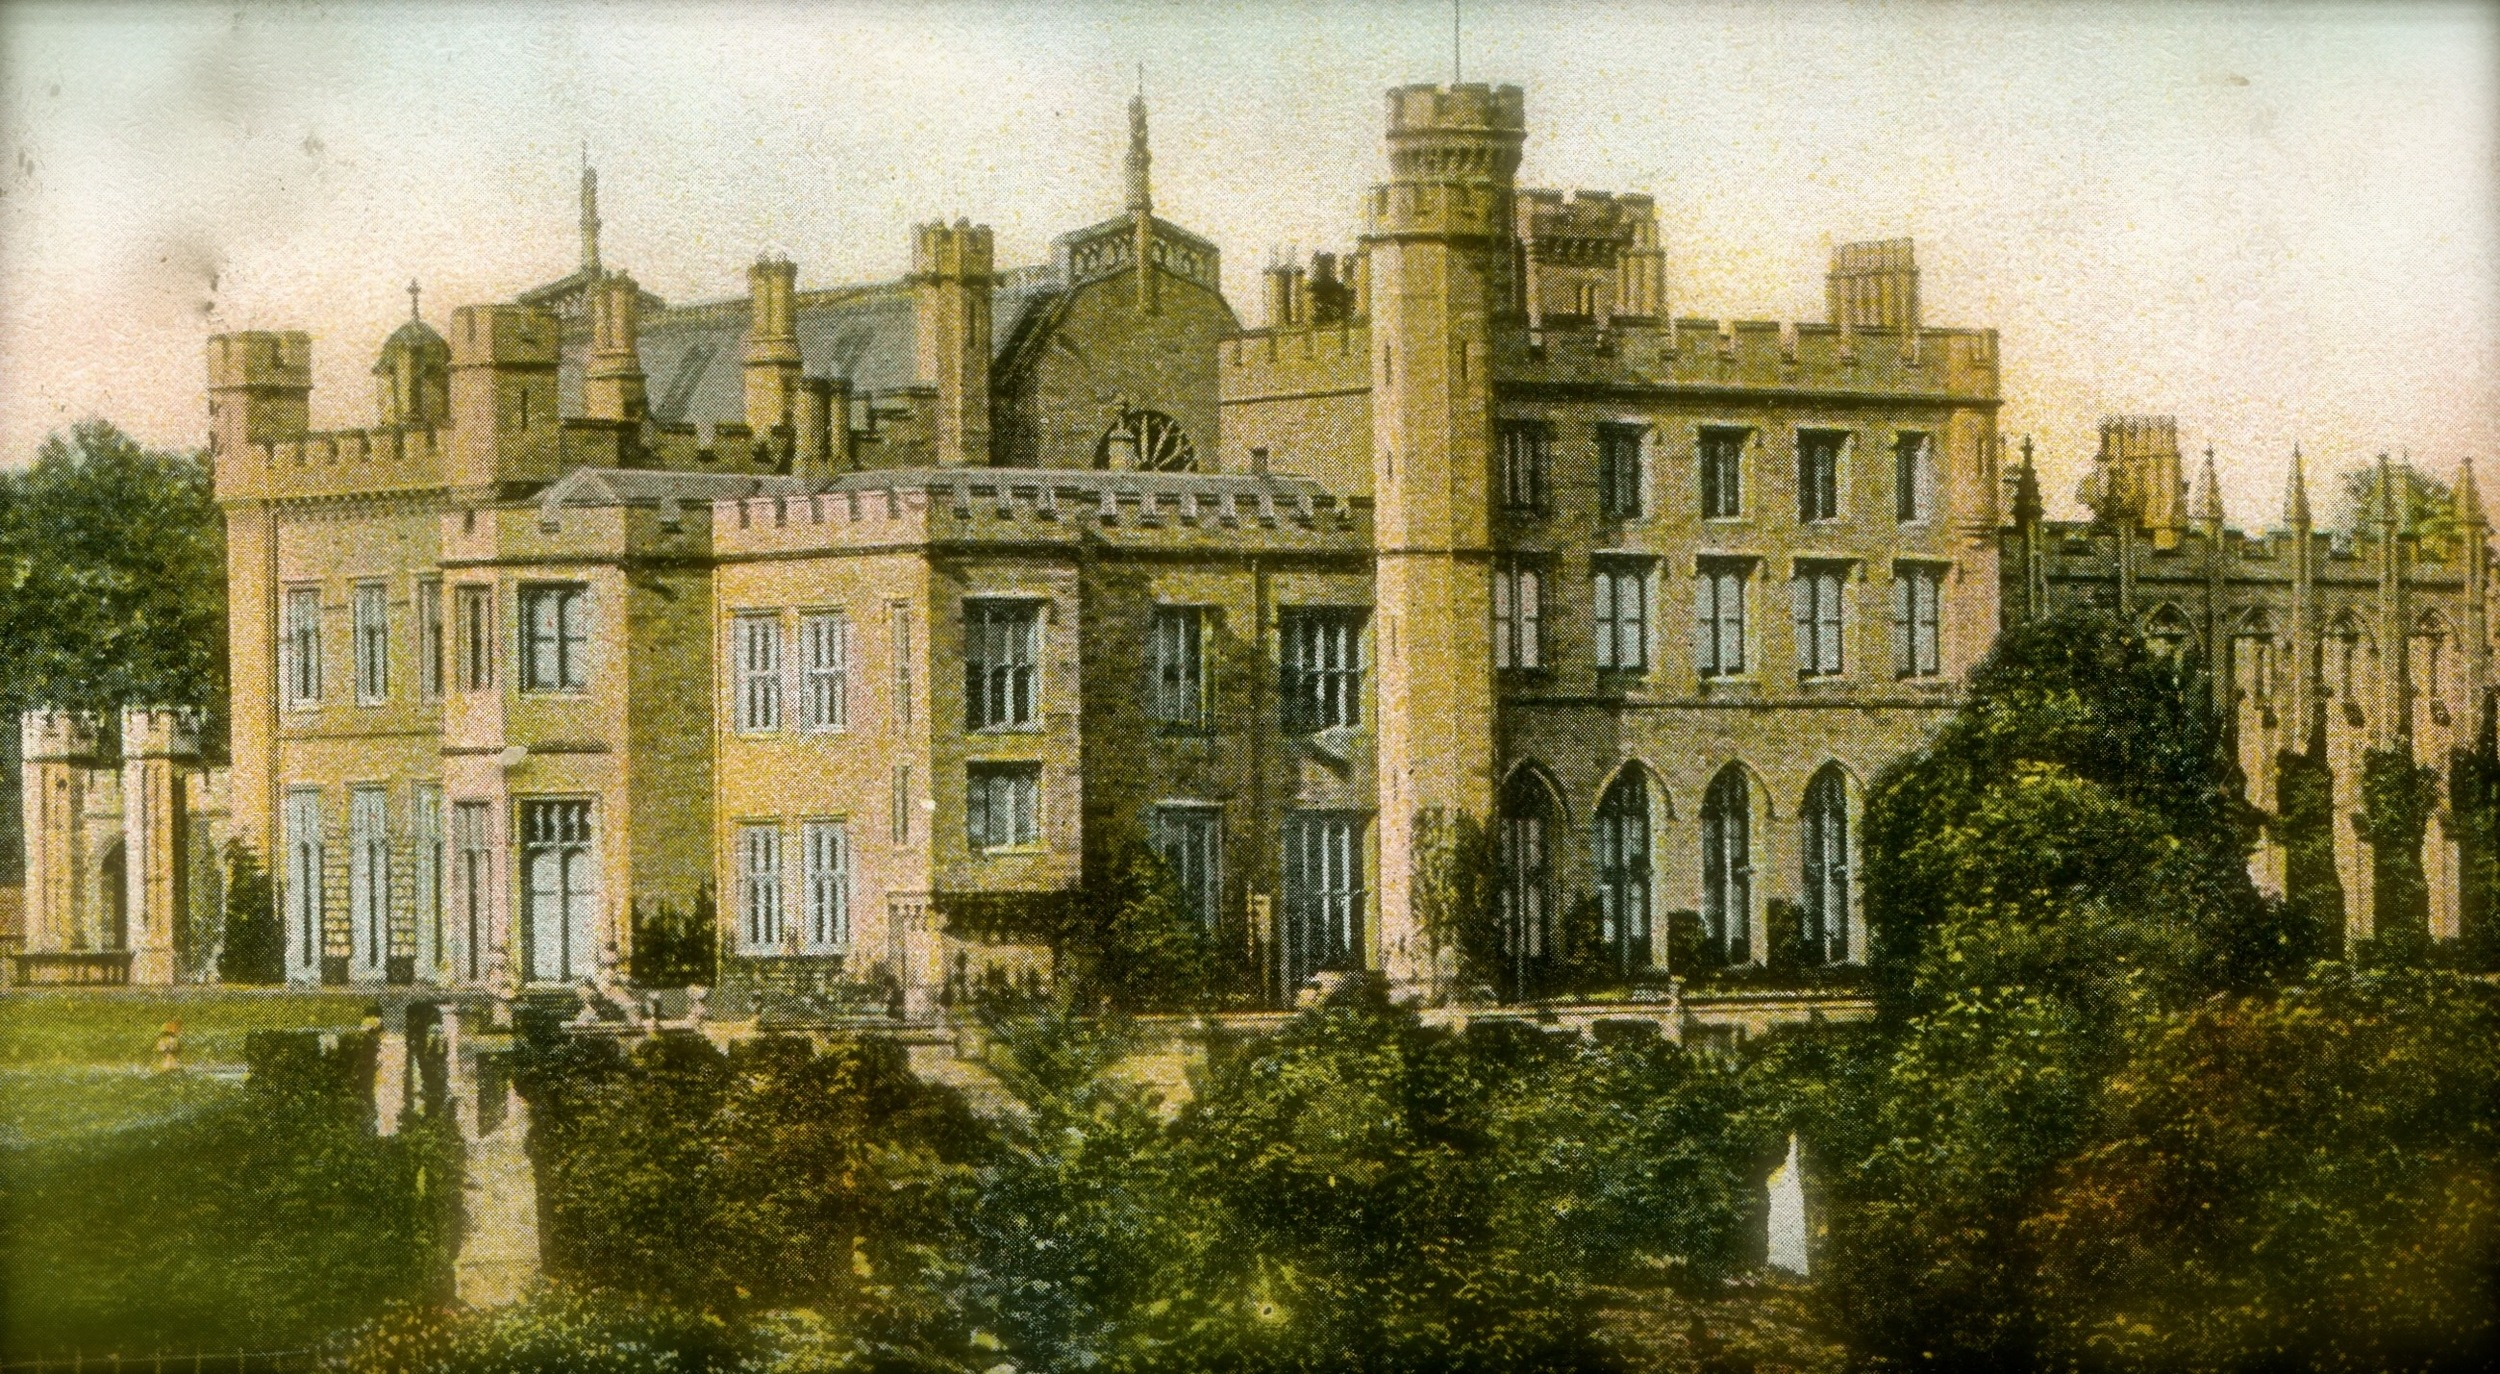 Lambton Castle, England